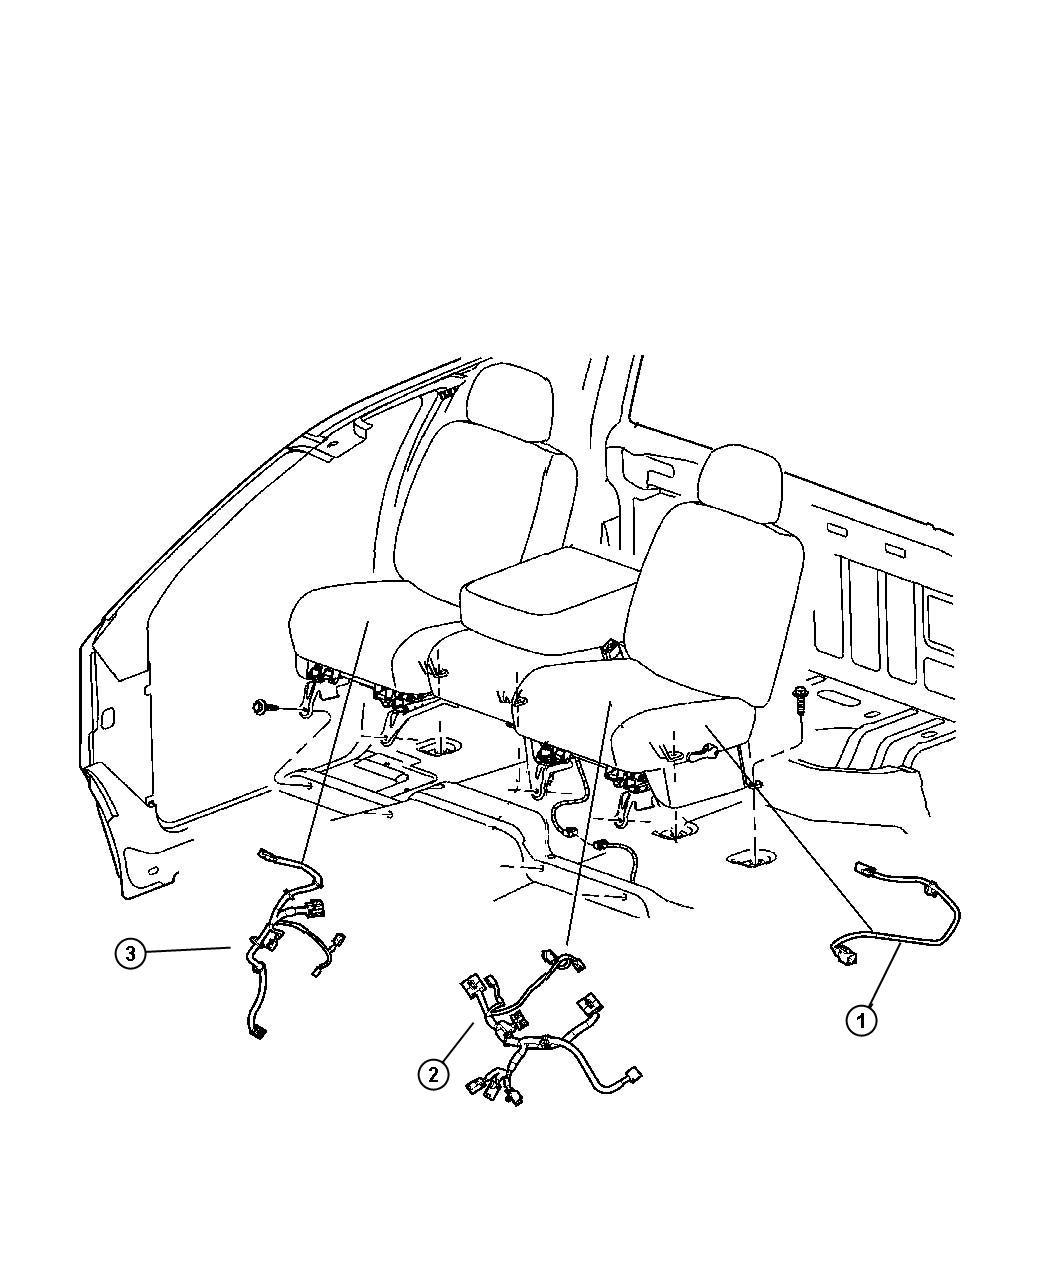 2007 Dodge Dakota Wiring  Power Seat  Seat   Heated Front